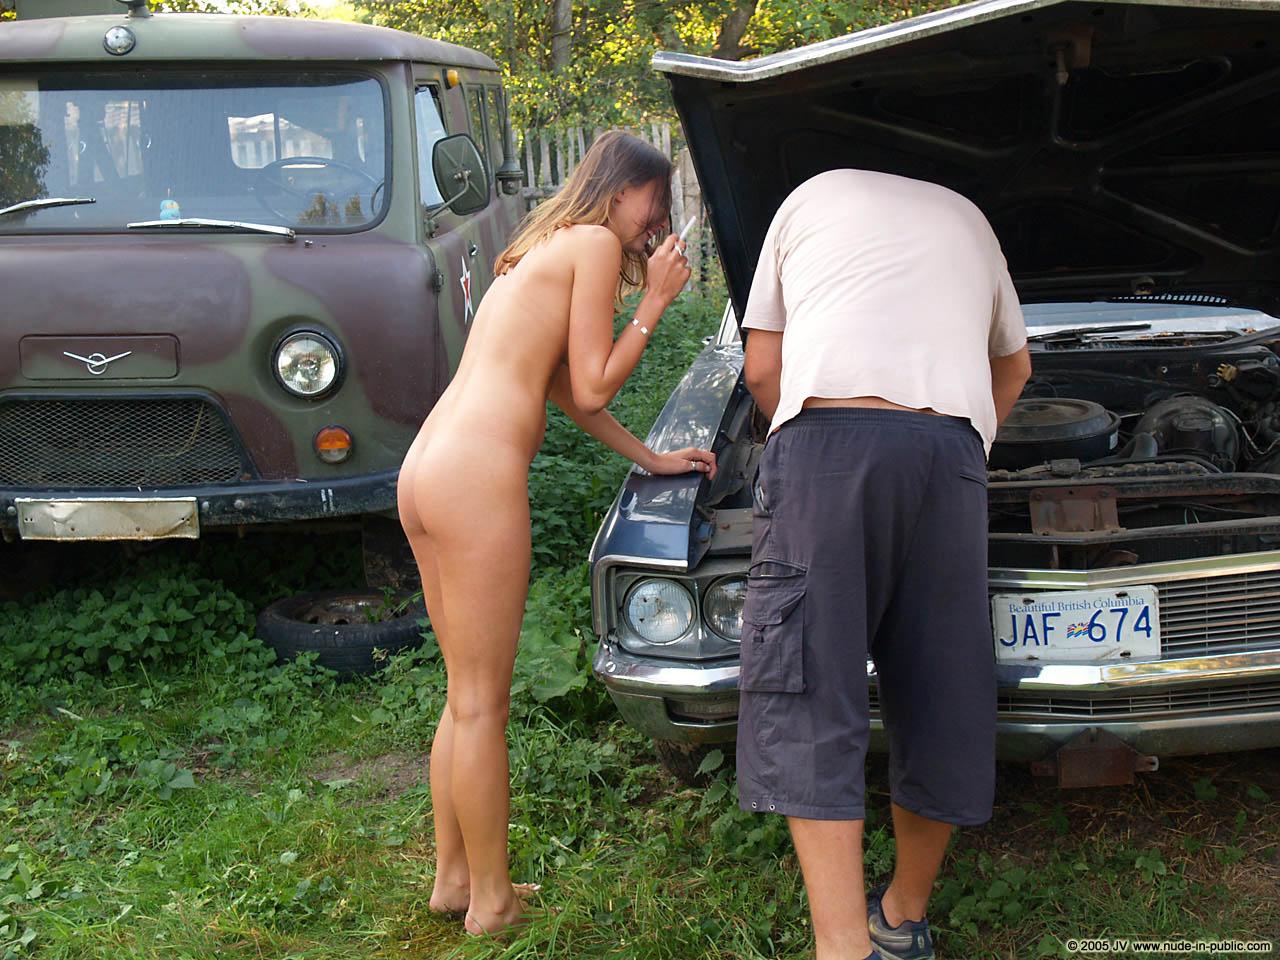 veronika-e-junkyard-cars-mechanic-nude-in-public-27